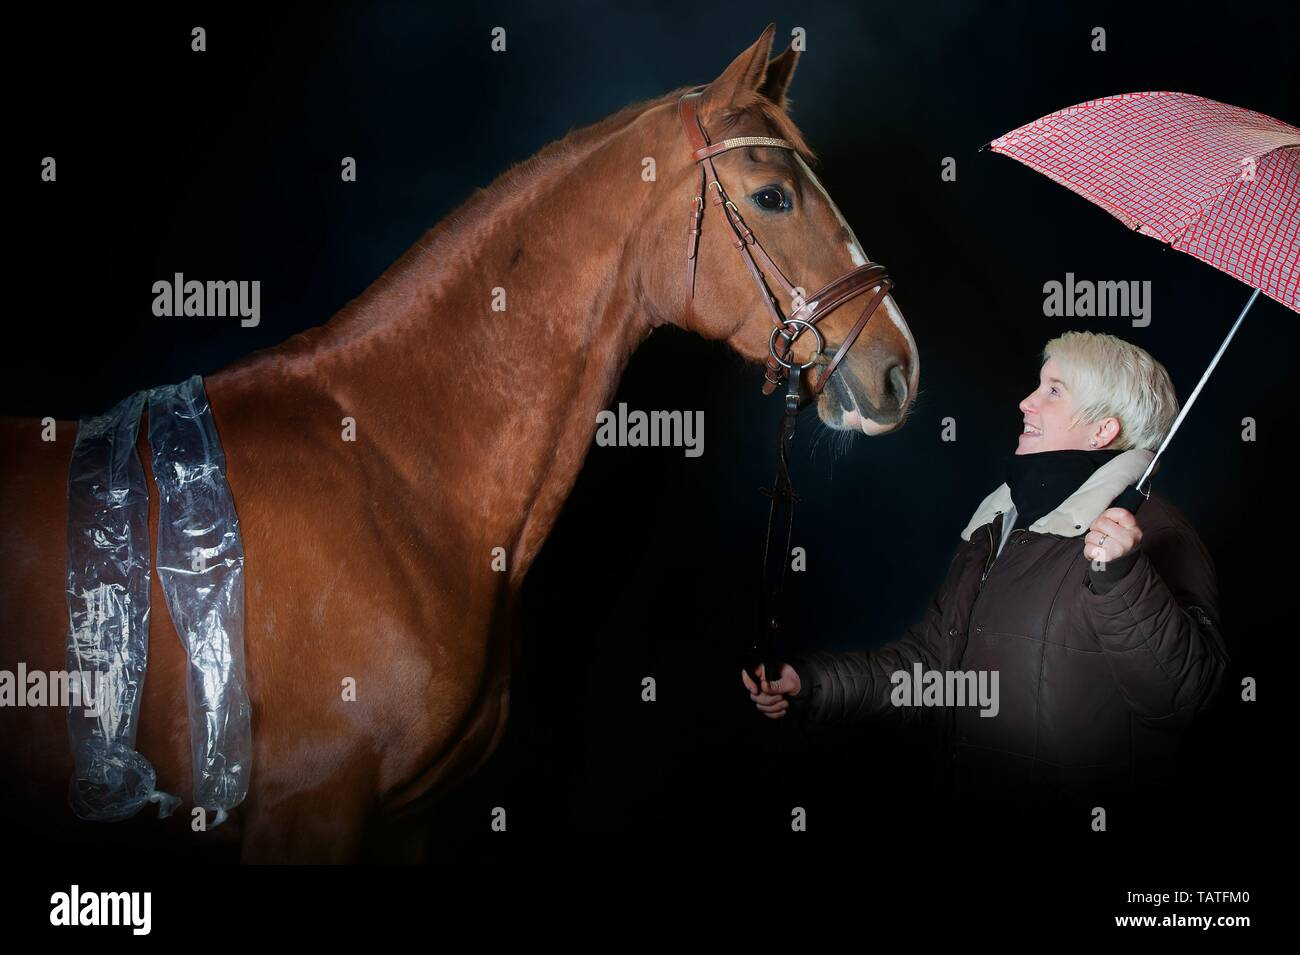 woman and Hanoverian Horse - Stock Image